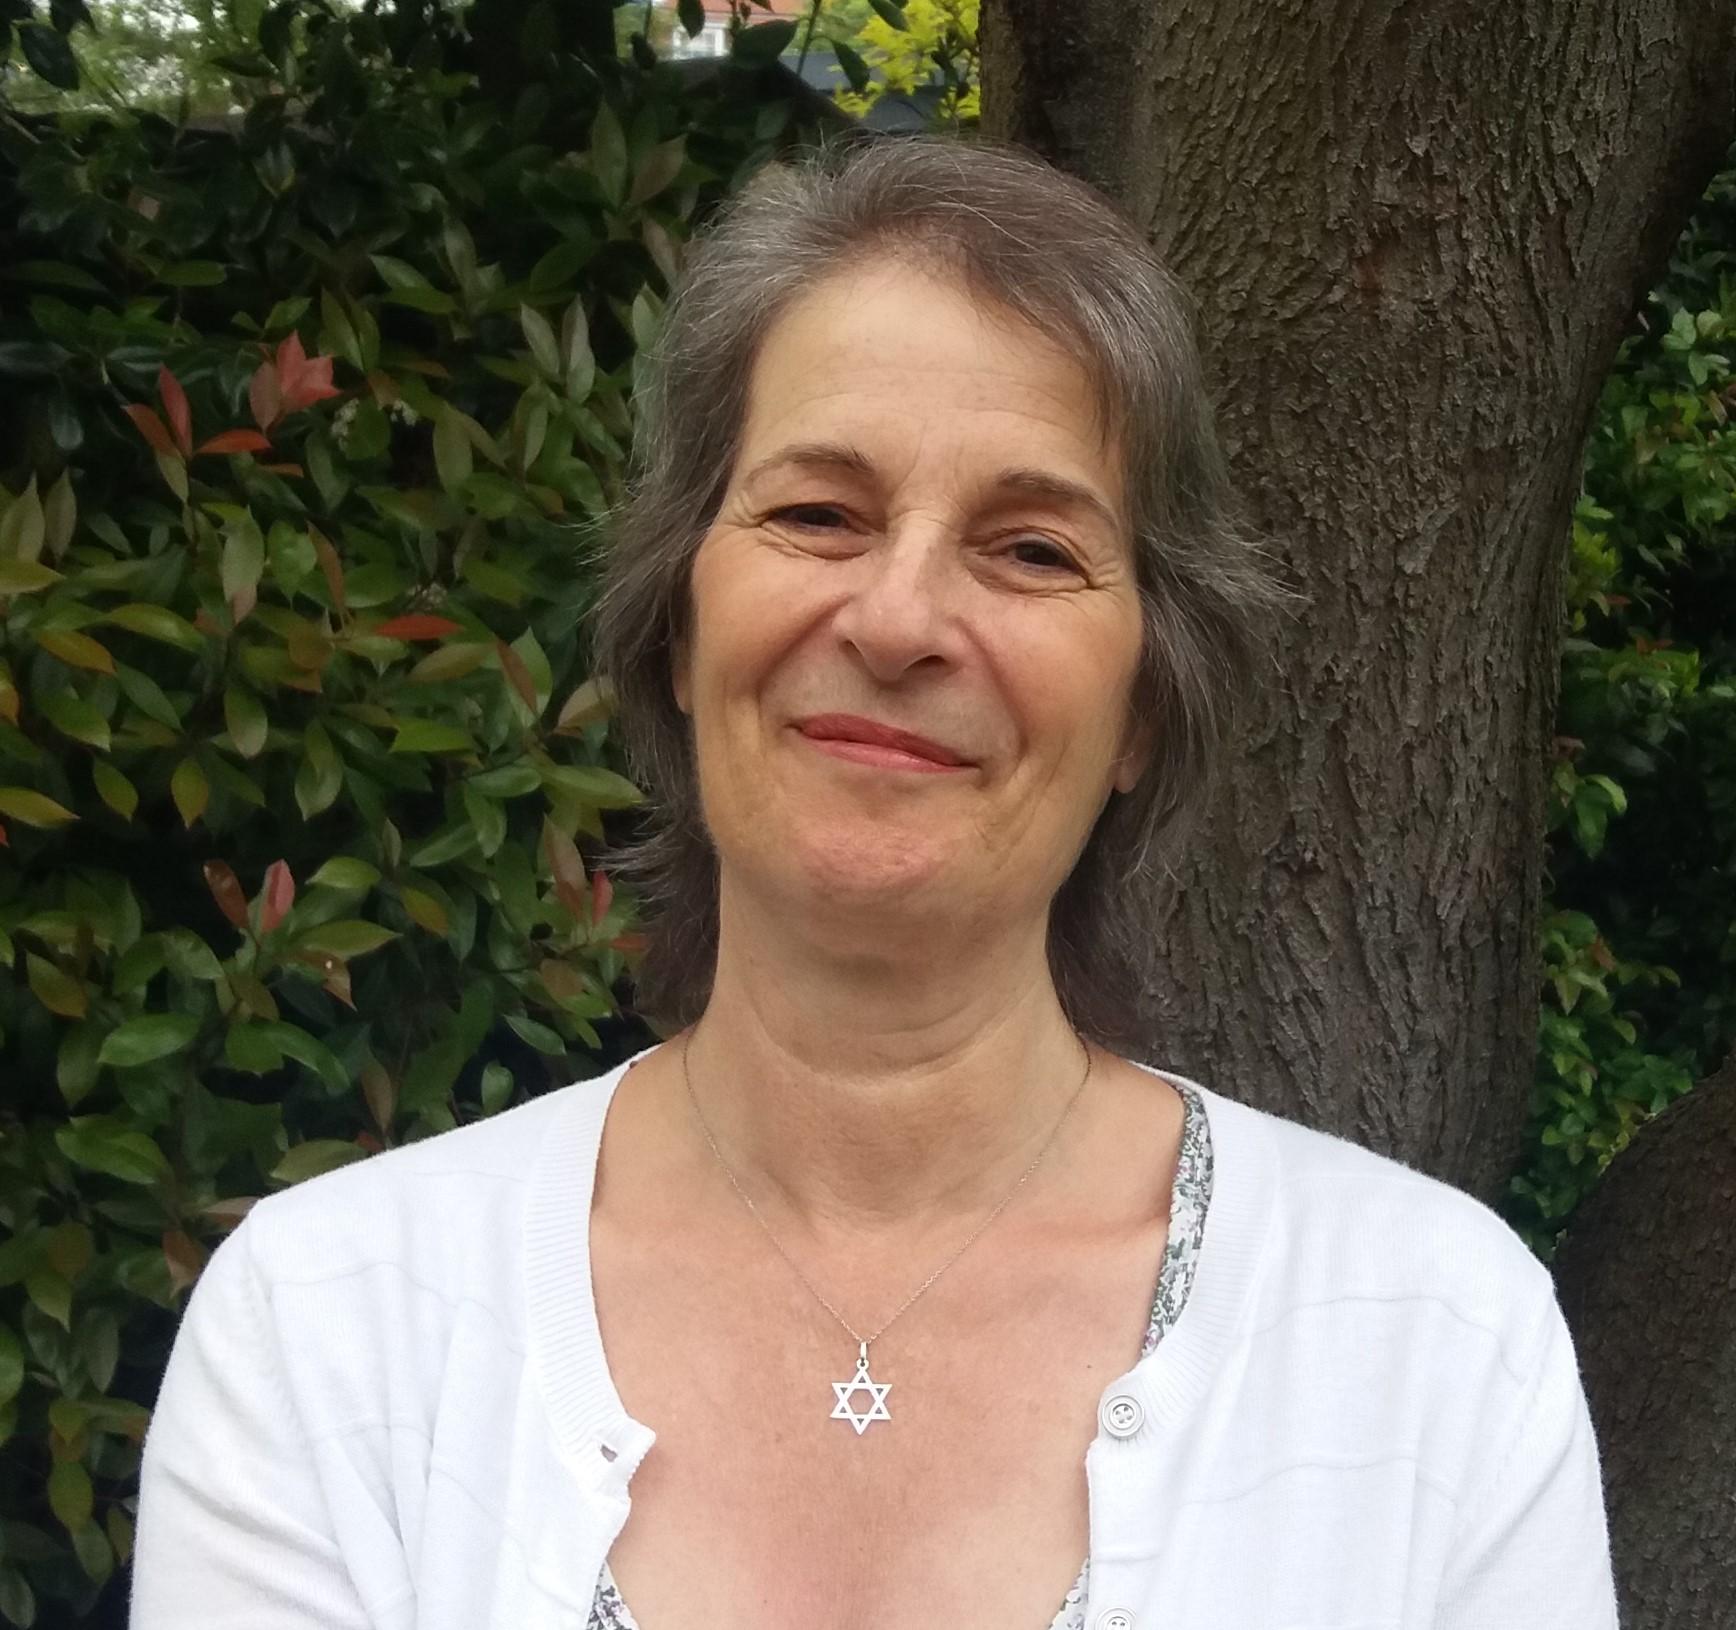 Jennifer Morland